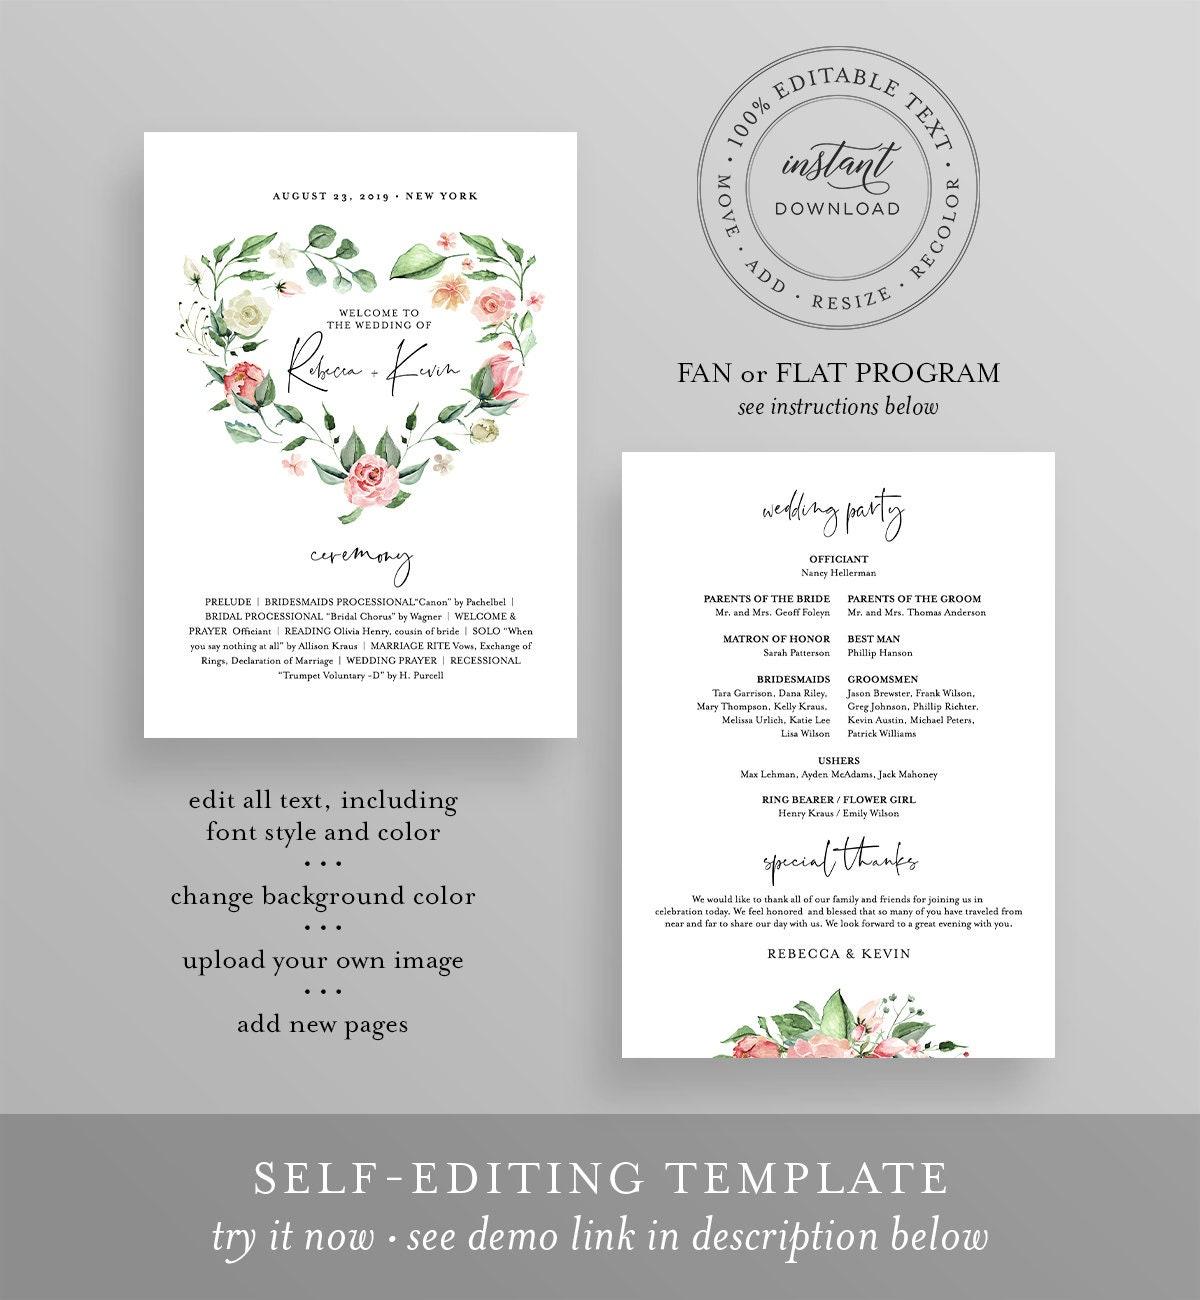 Wedding Program Fan Template RC0006 Watercolor Ceremony Program Printable Templett Order of Ceremony Template